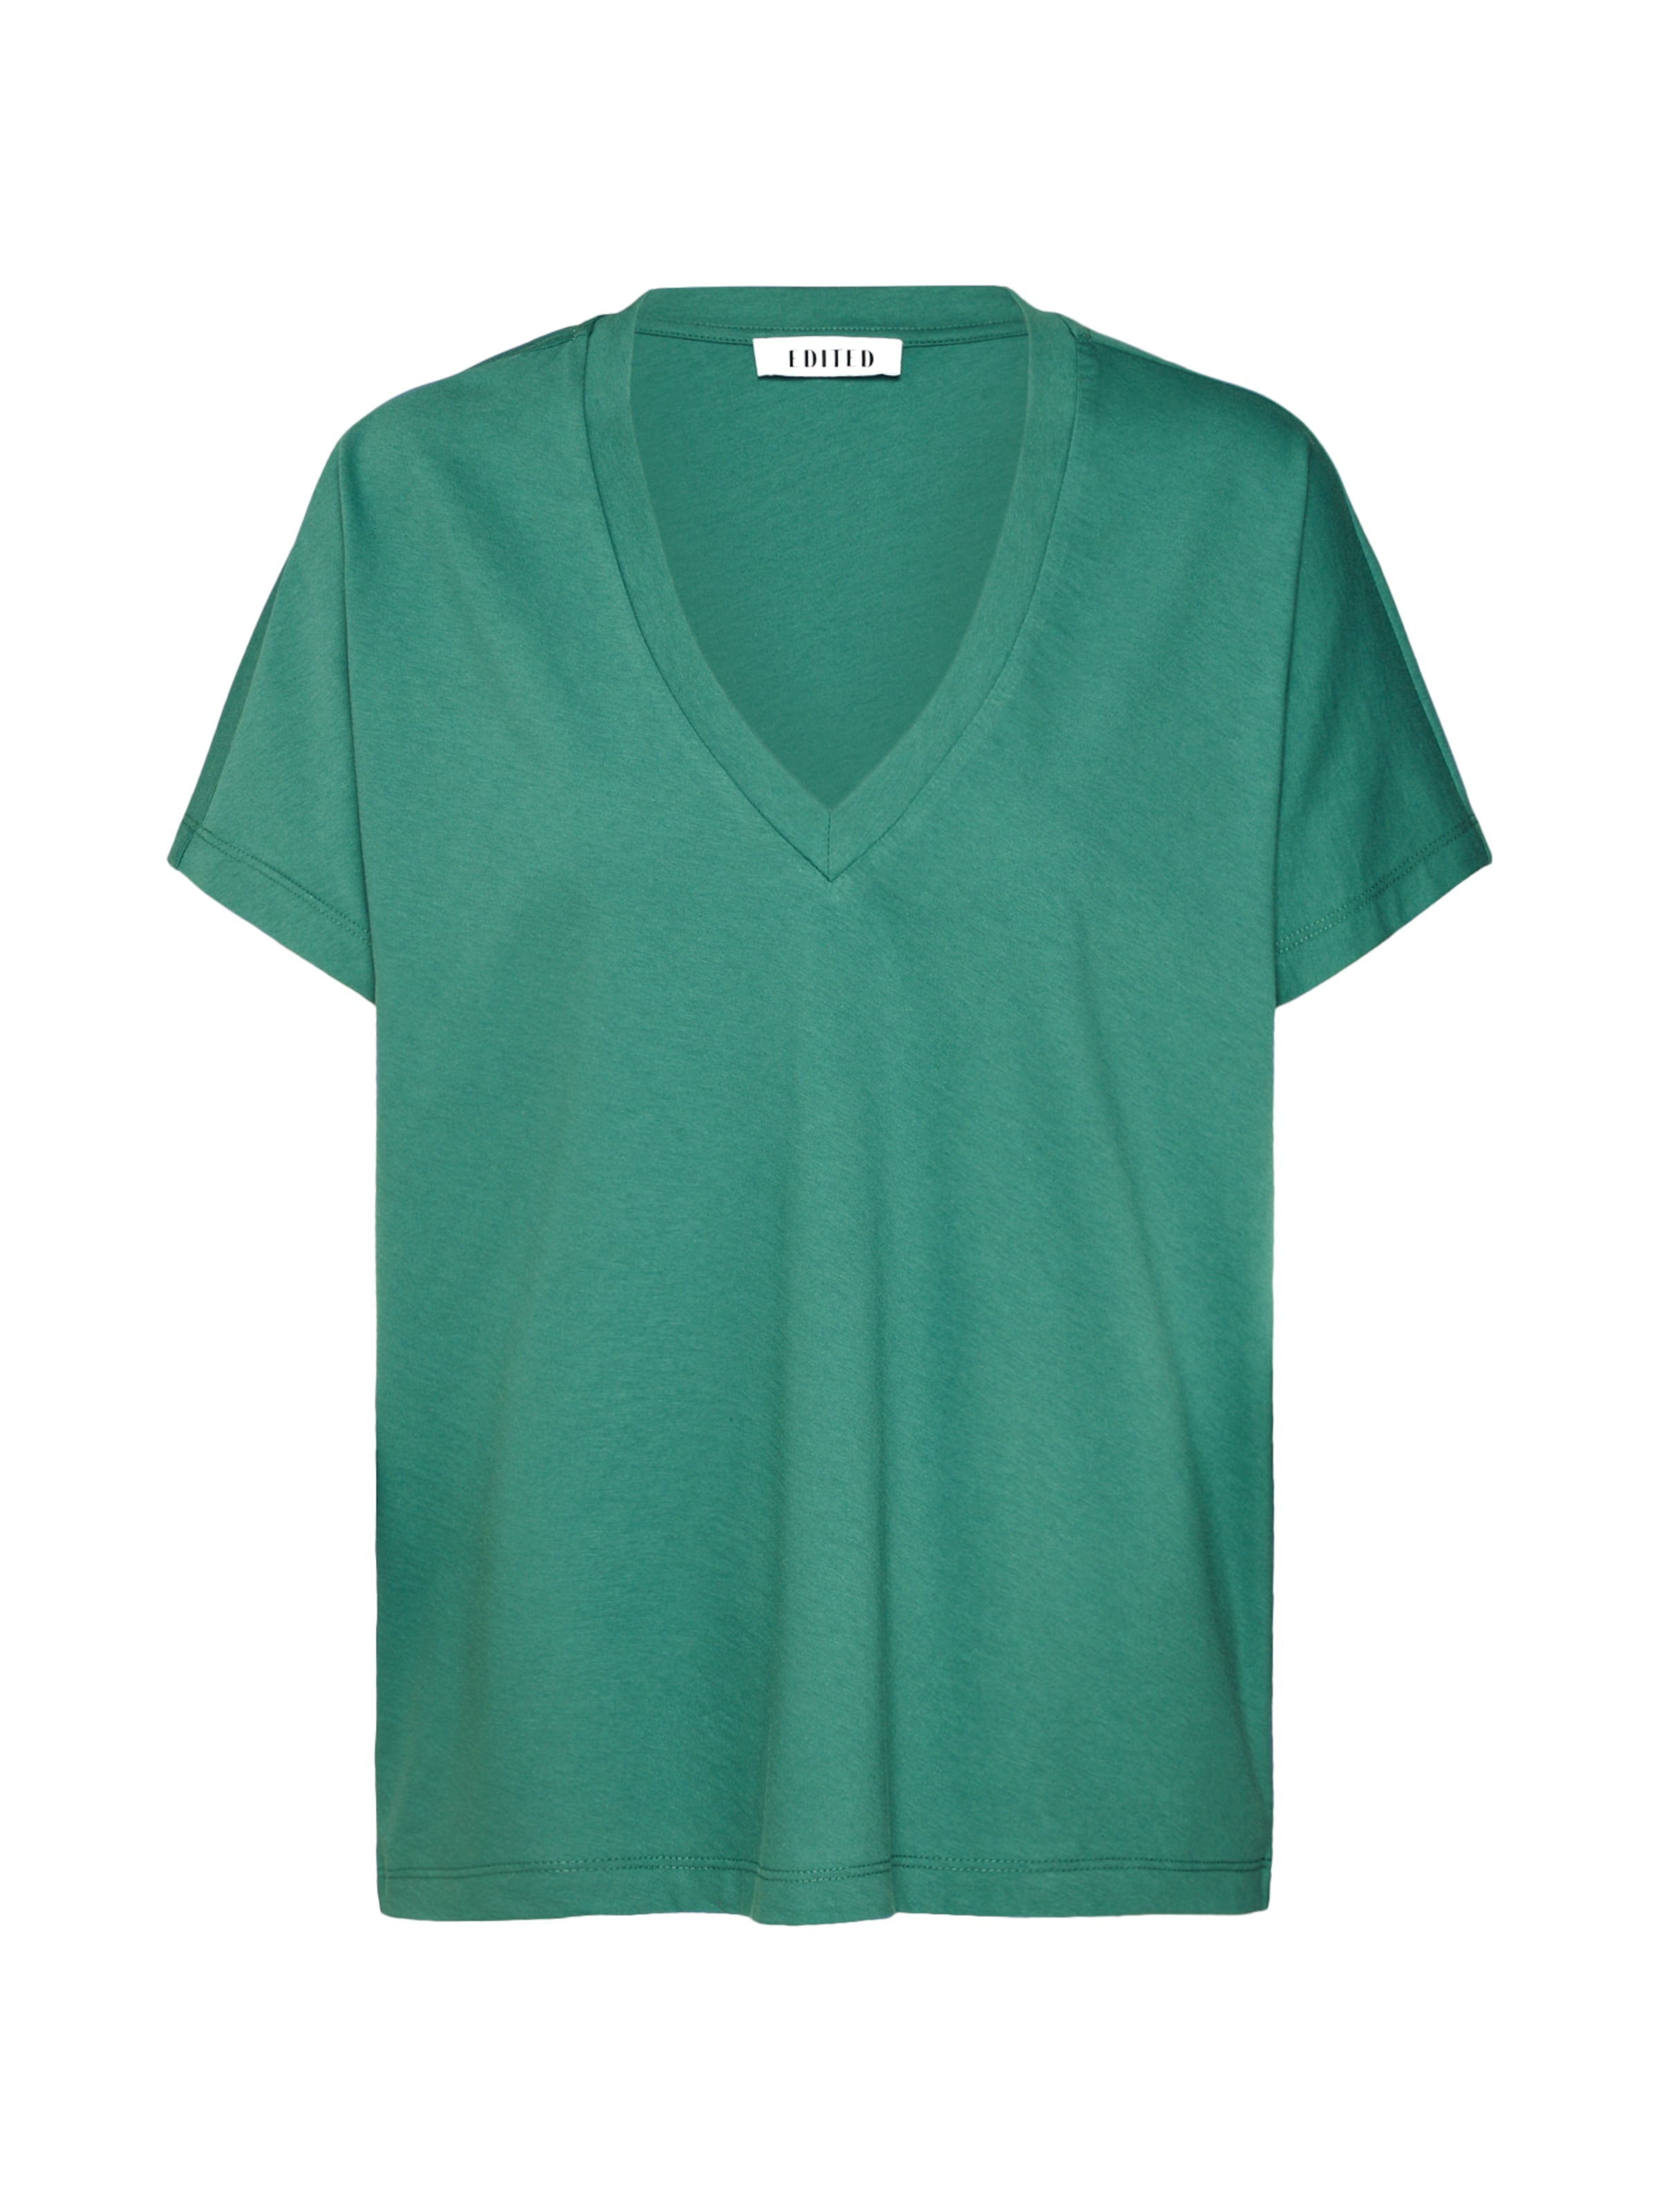 'terra' Shirt Shirt Edited In Dunkelgrün Edited A4R35jL